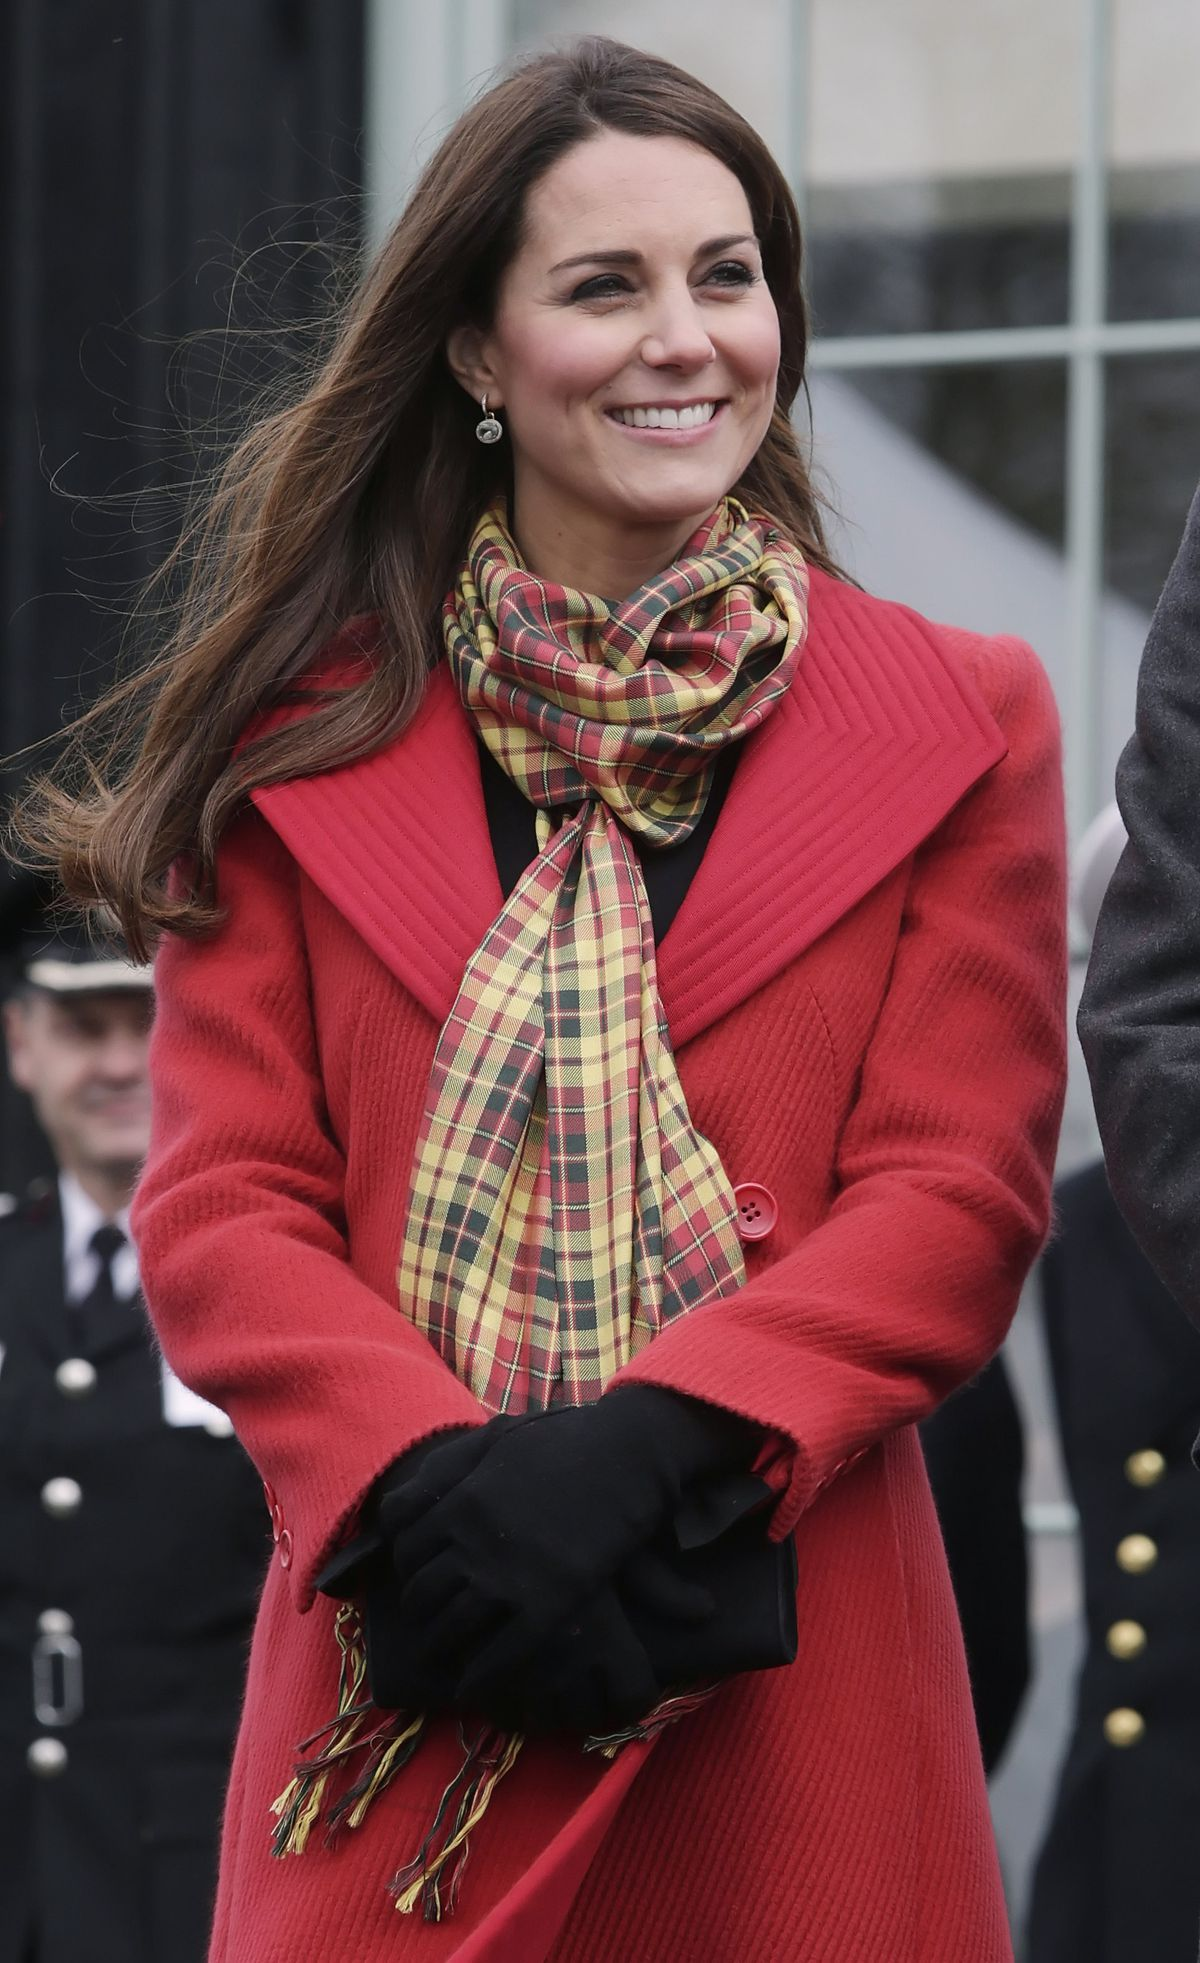 Kate Middleton, a.k.a. the Countess of Strathearn, wearing a Strathearn tartan scarf.